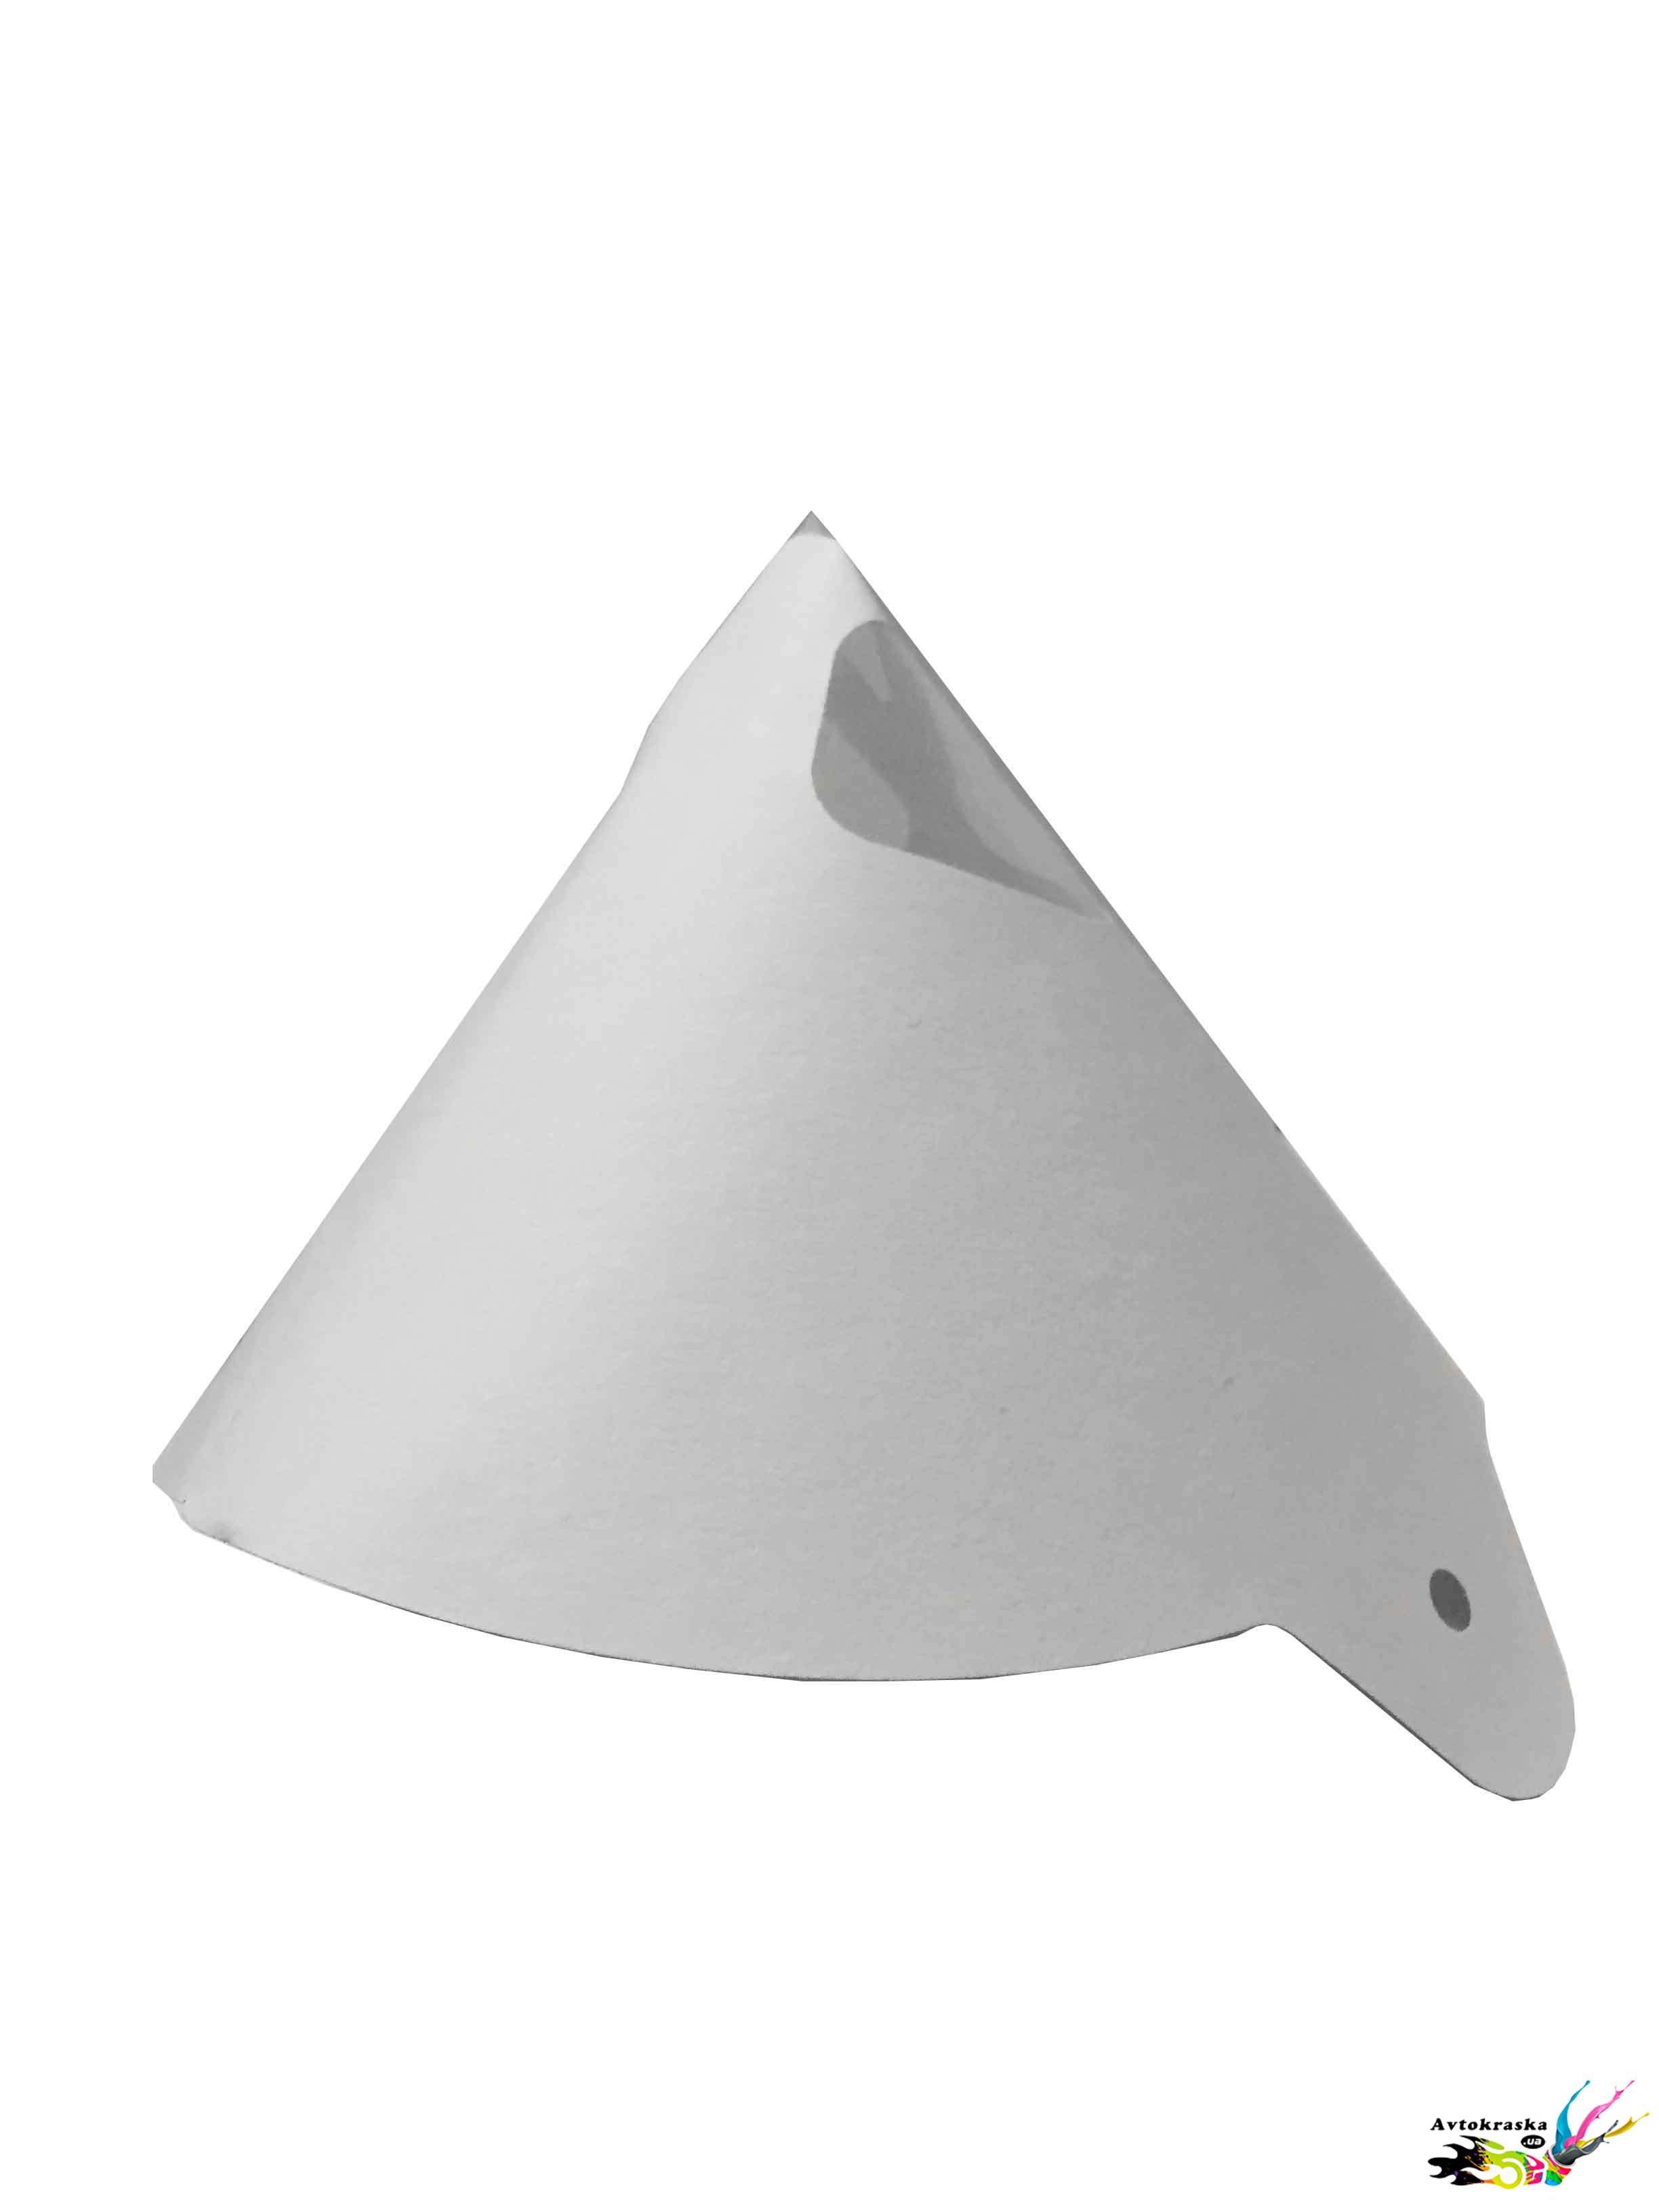 Сито/Фильтр для краски NCPro 190 мкн